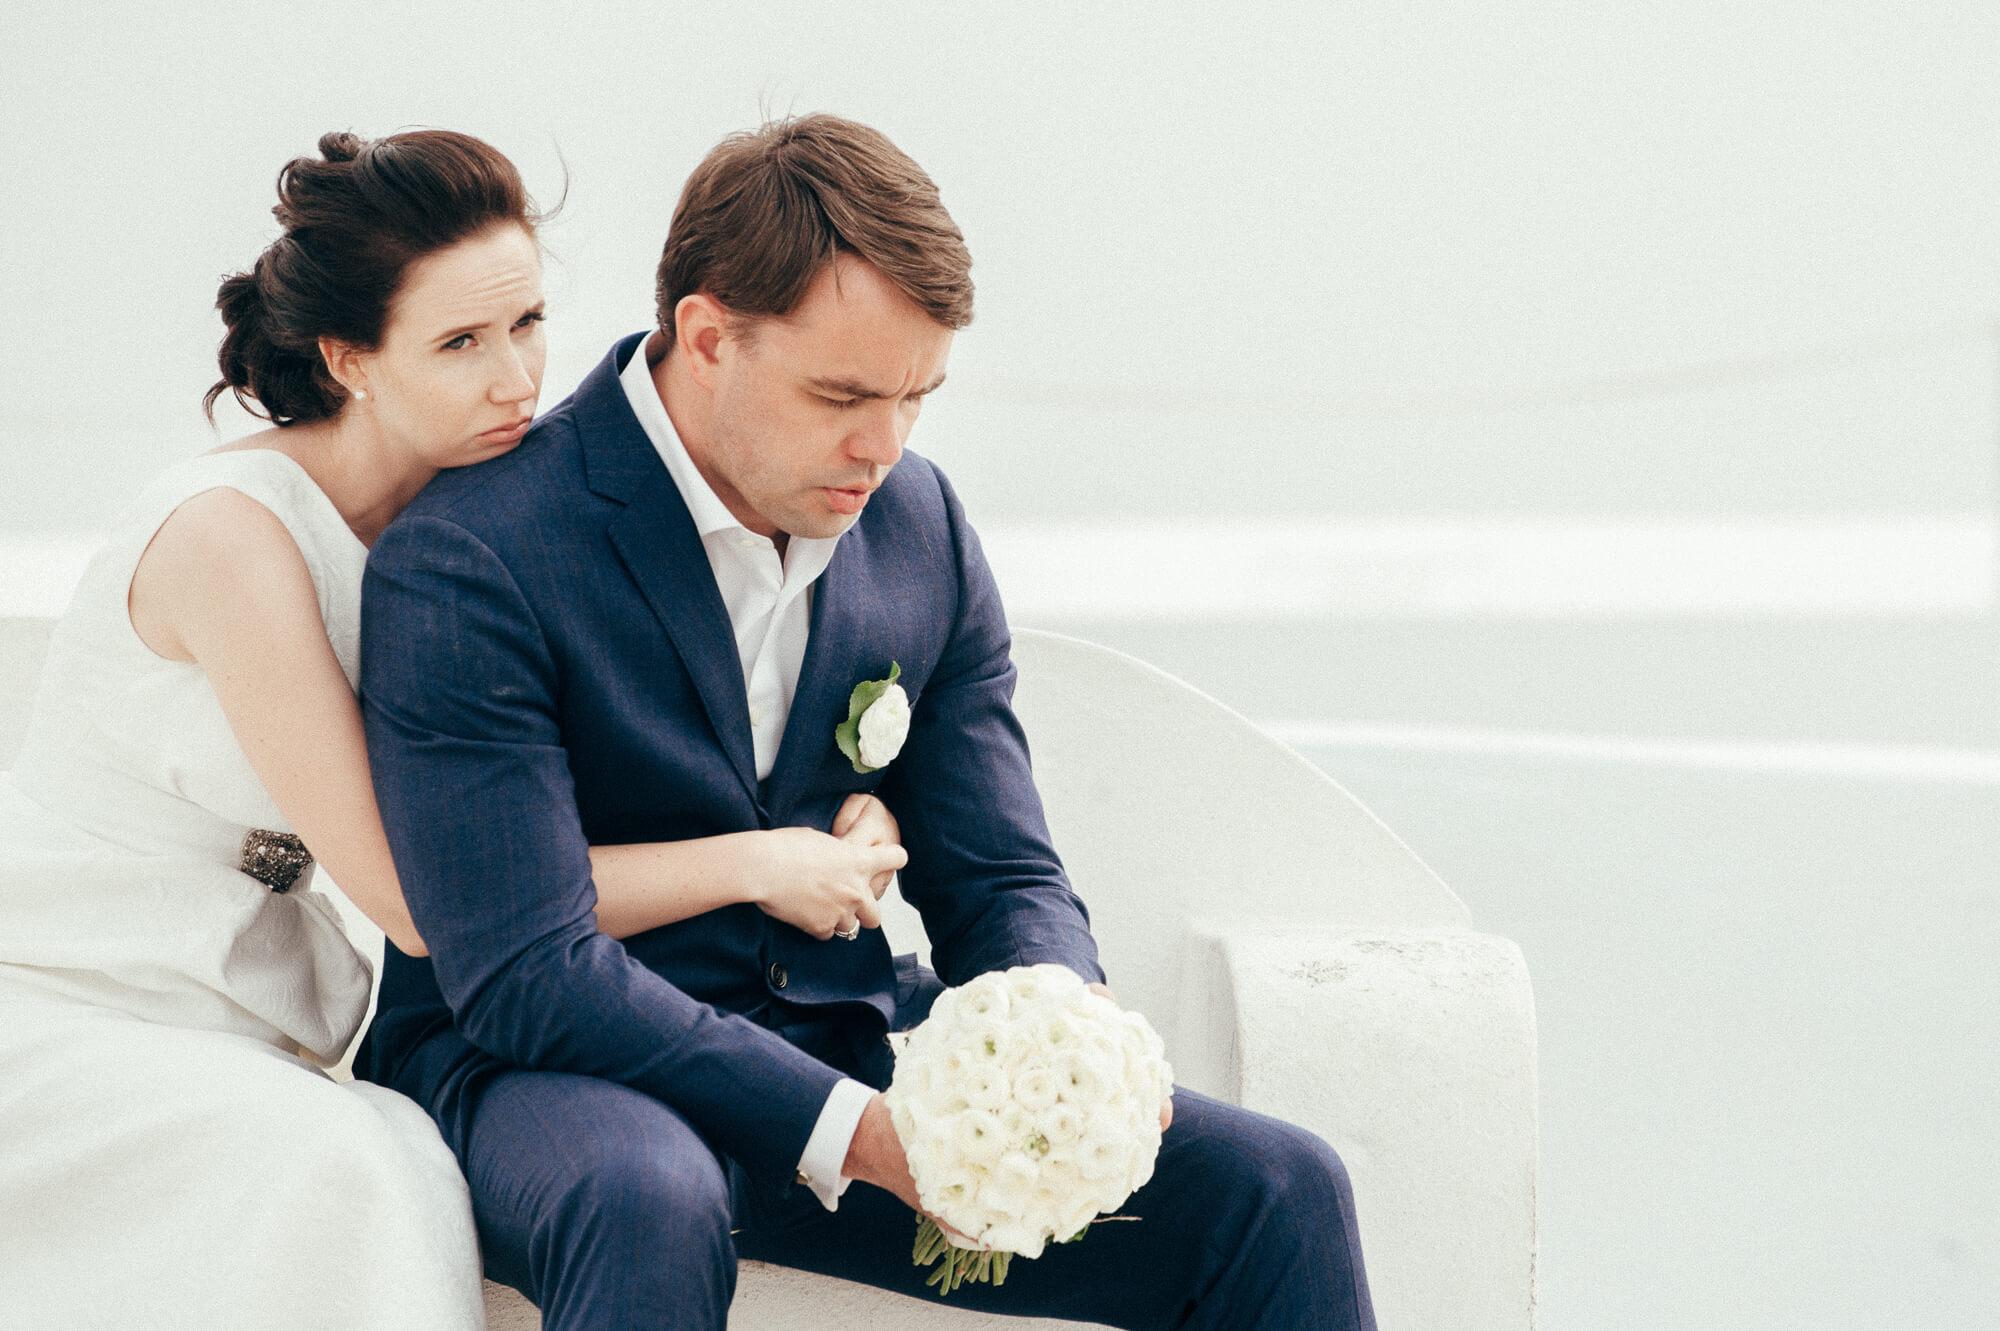 manes-wedding-photographer-greece-146